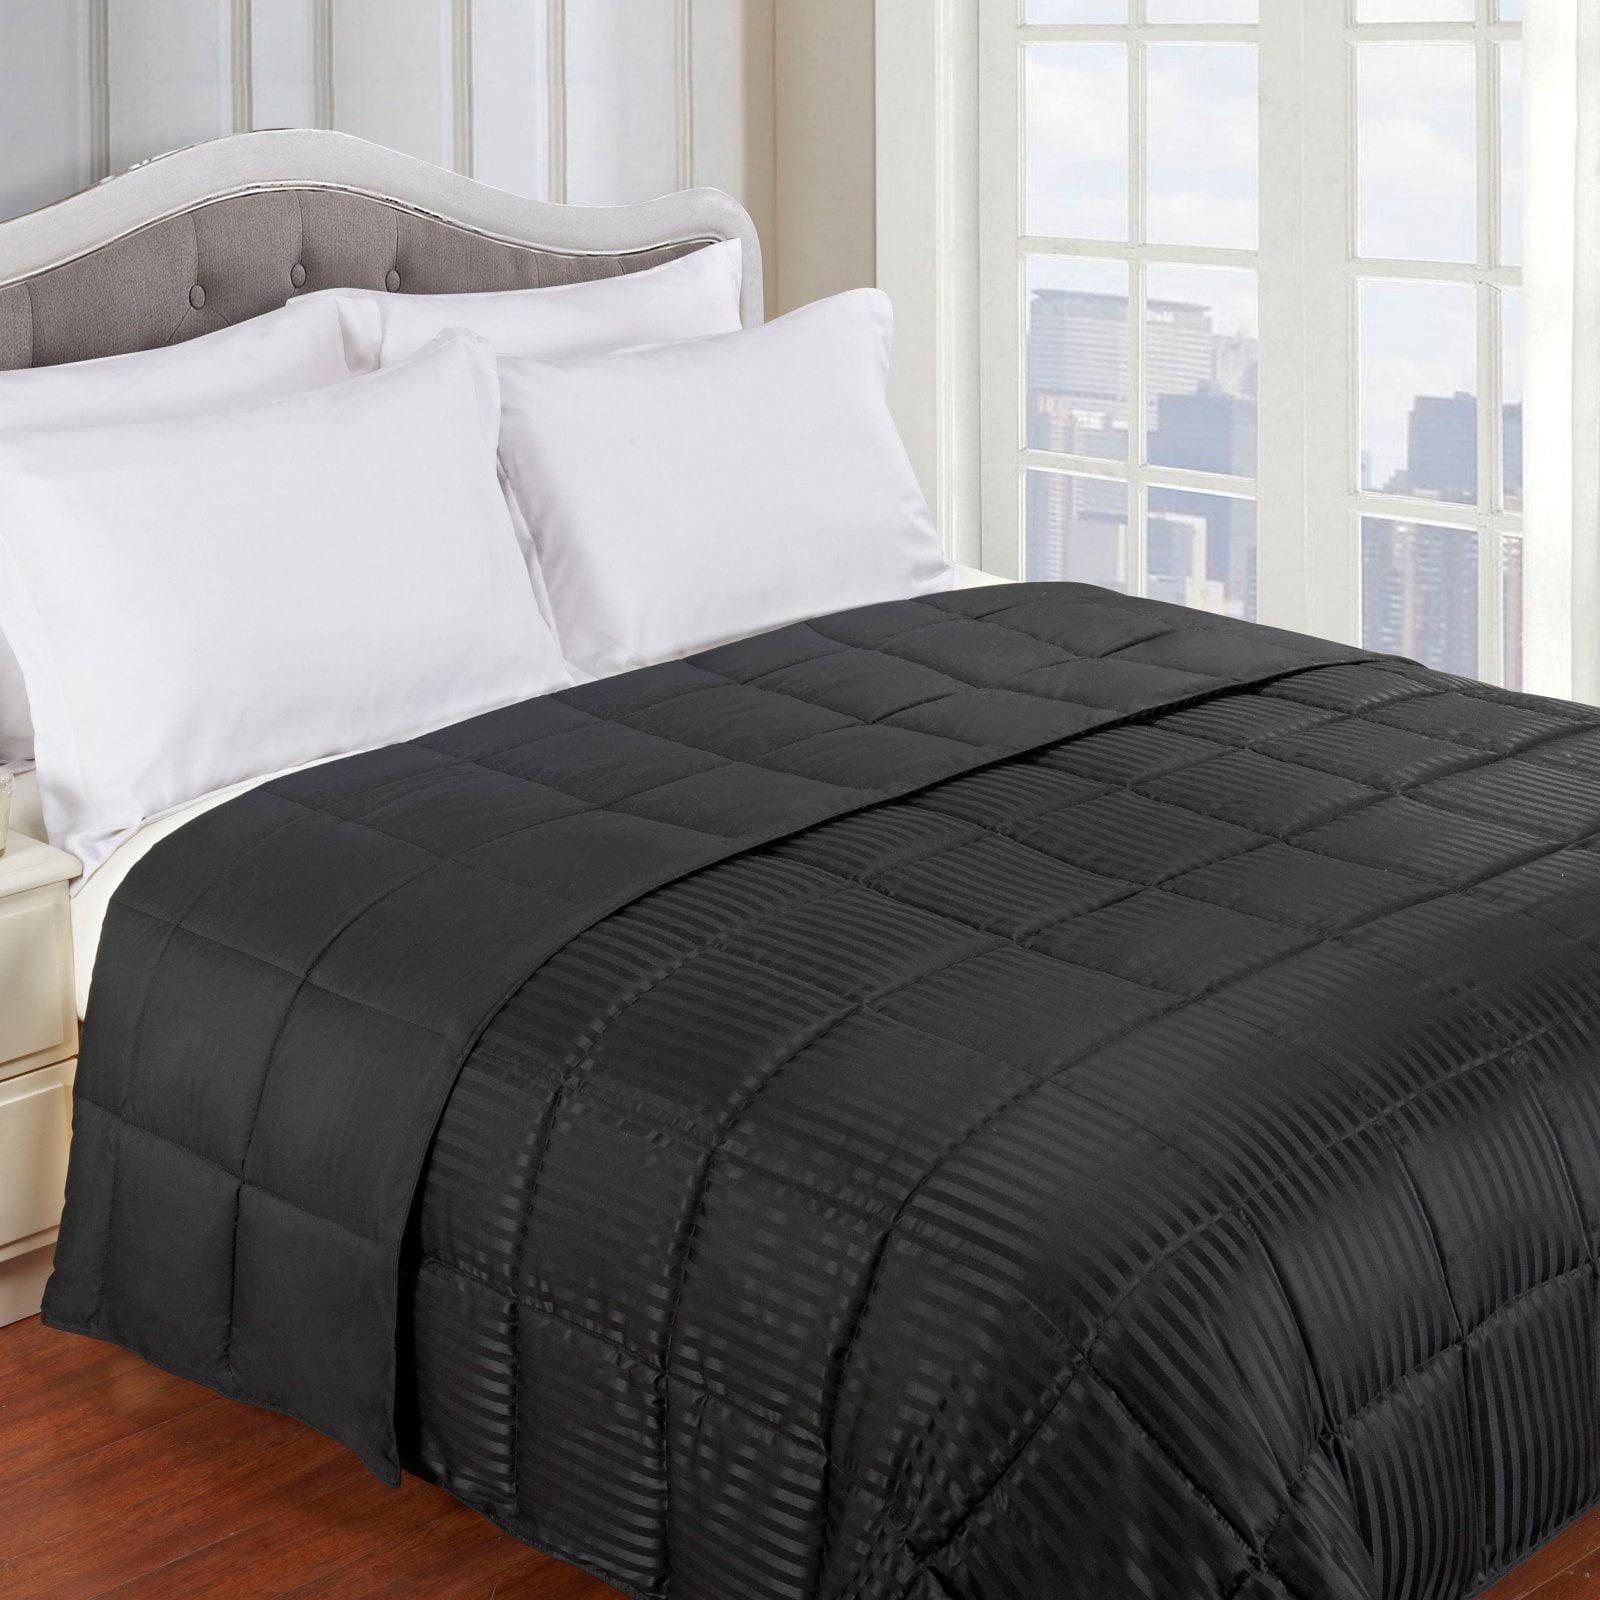 Lightweight All-season Down Alternative Reversible Blanket by Home City Inc